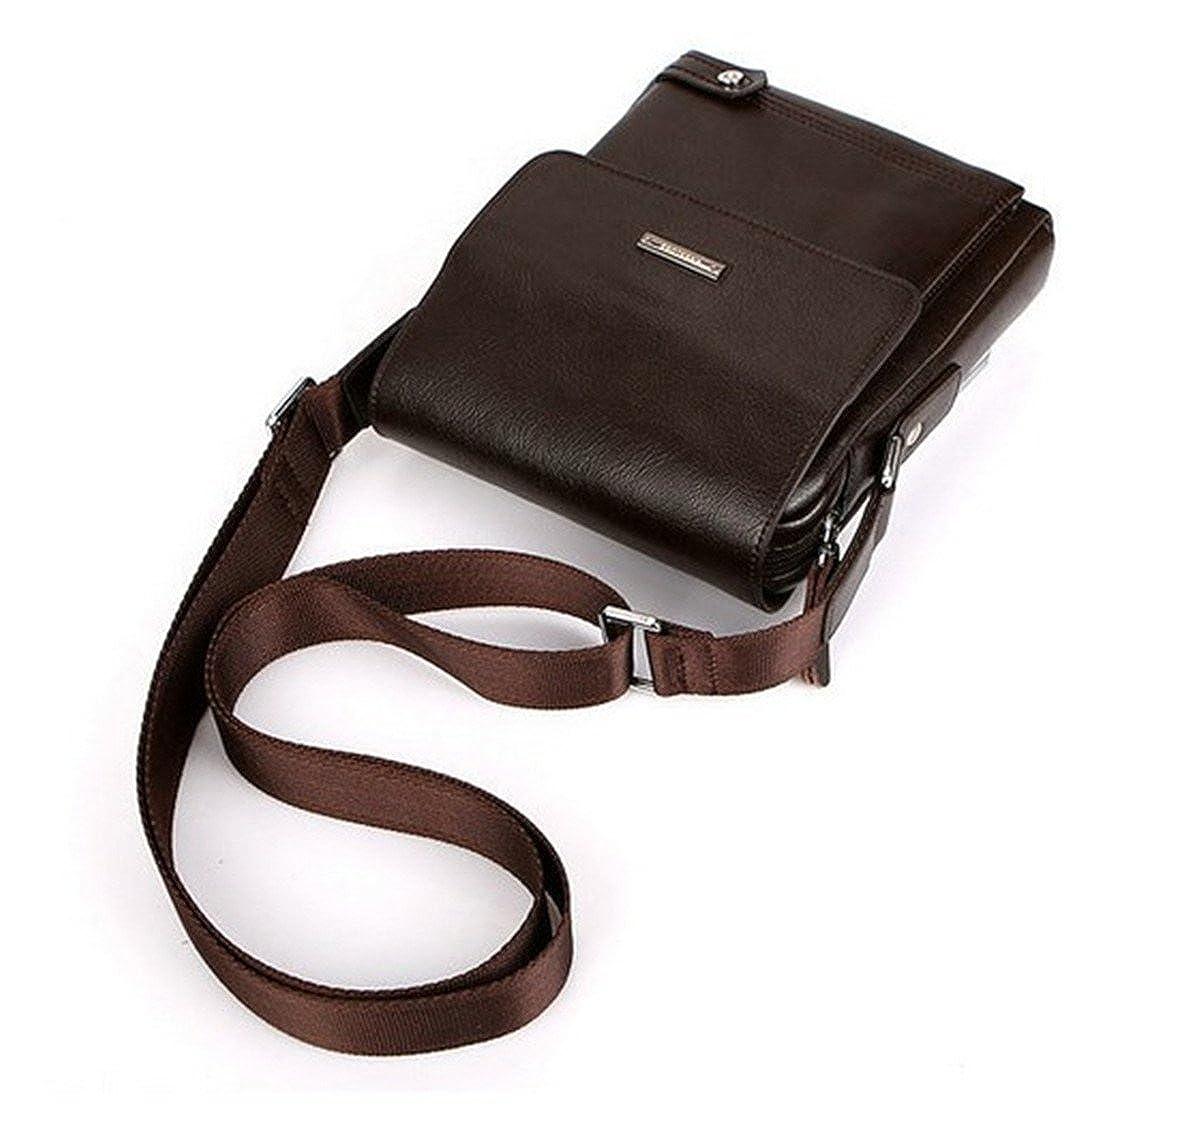 BININBOX Men Shoulder Business Messenger Briefcase Bag Cross Body Handbag Brown